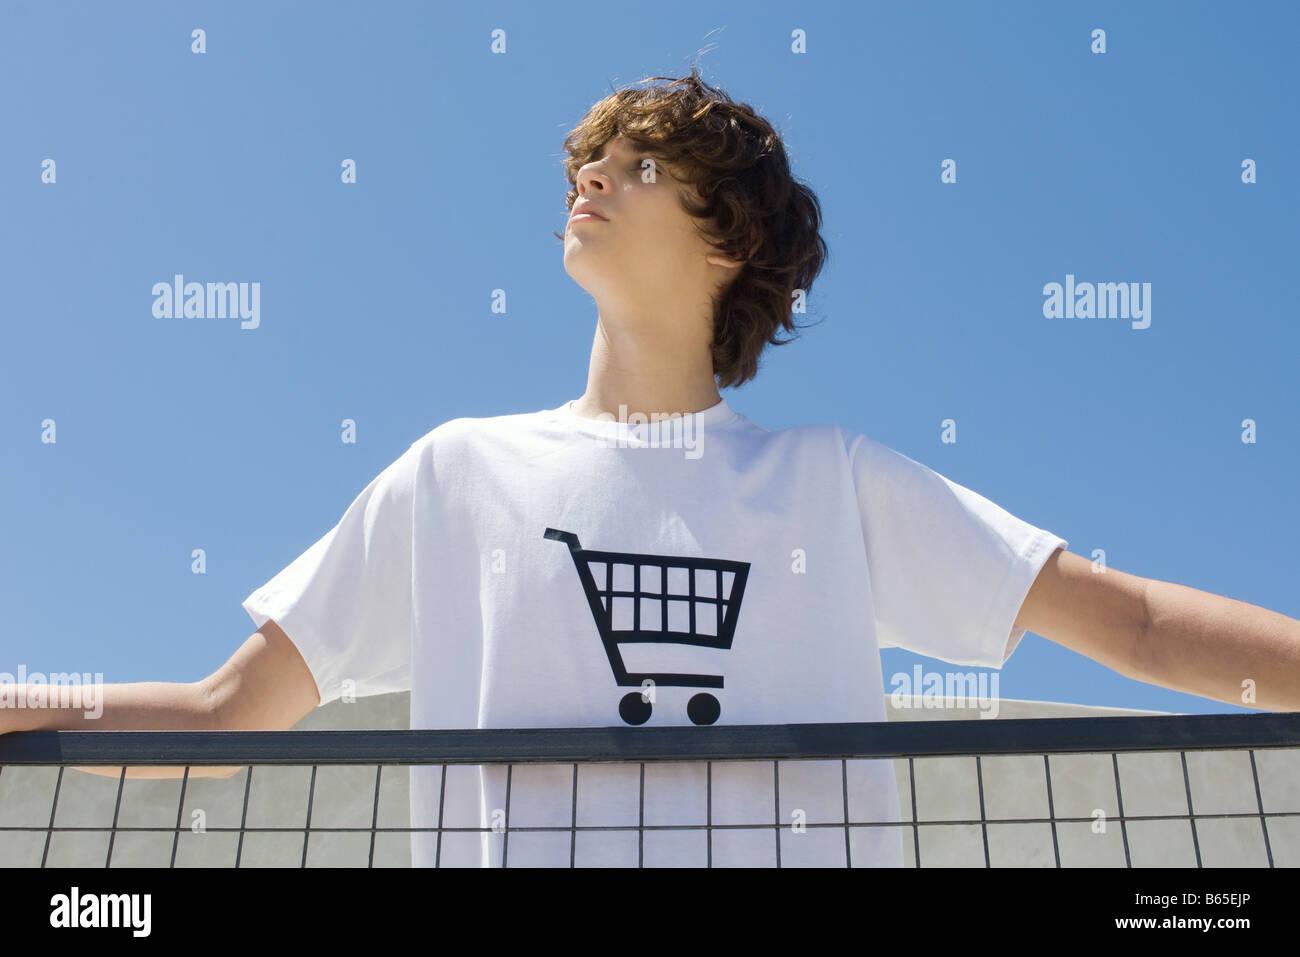 Teenage boy wearing tee-shirt printed with shopping cart, standing at railing, looking up - Stock Image